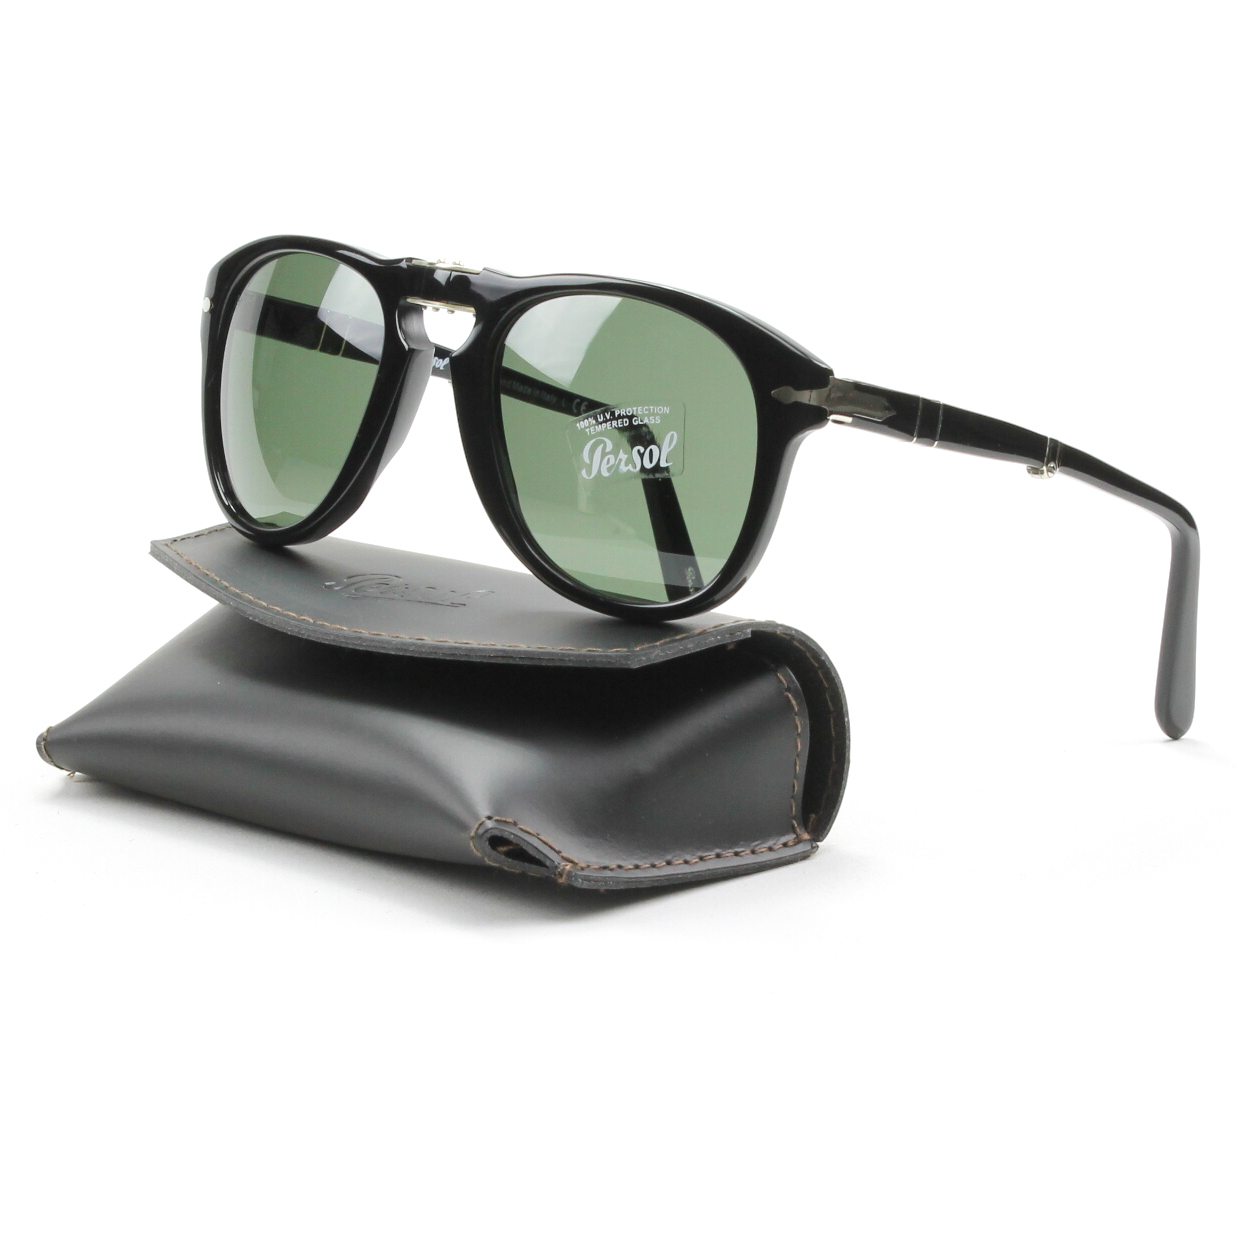 Persol 714 Folding Sunglasses 95/31 Black, Grey Crystal Lens PO0714 52mm NEW | eBay